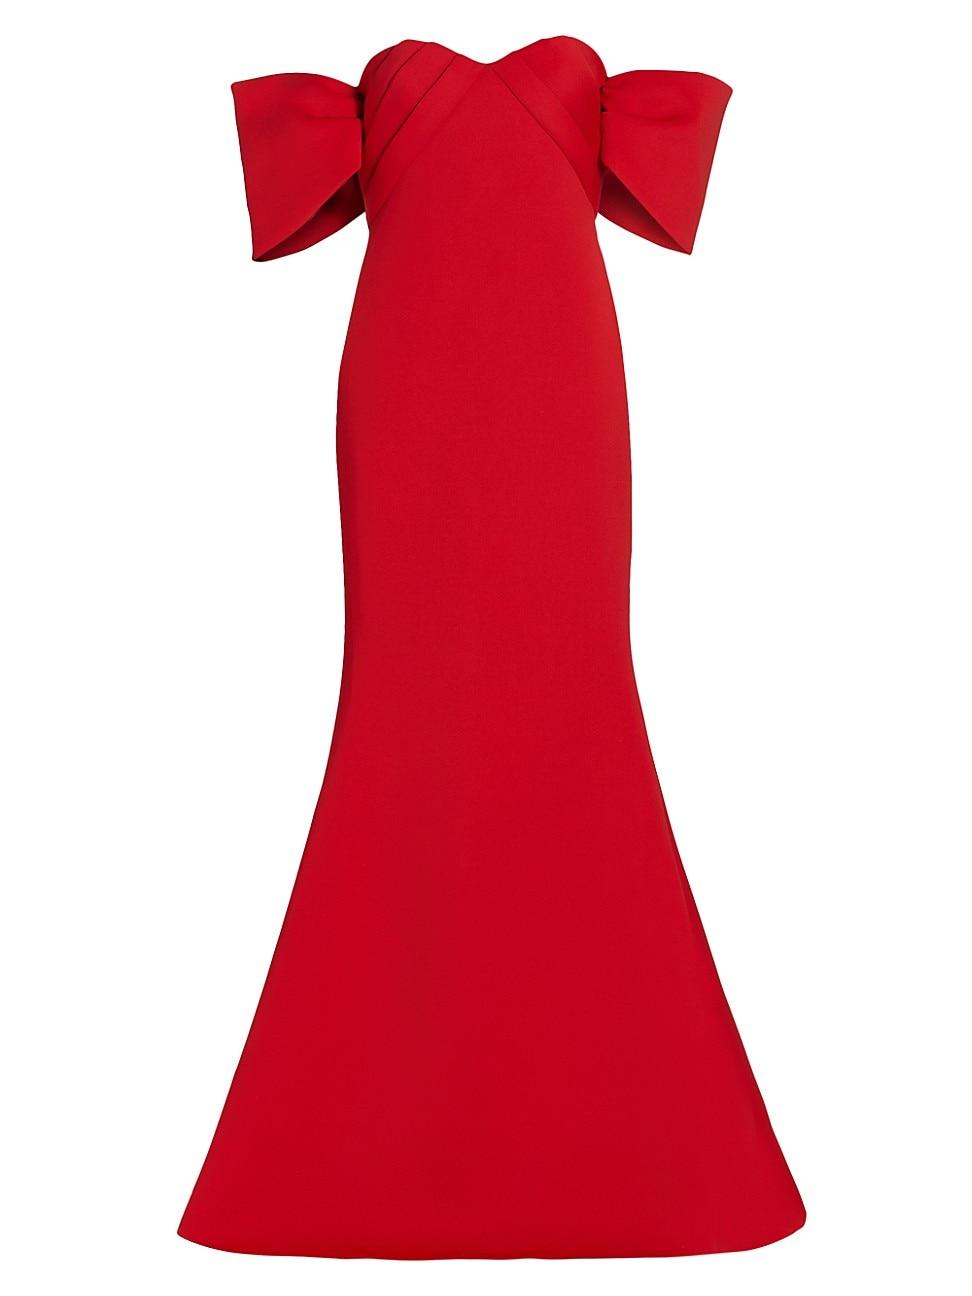 Badgley Mischka Gowns WOMEN'S SCUBA OFF-THE-SHOULDER GOWN